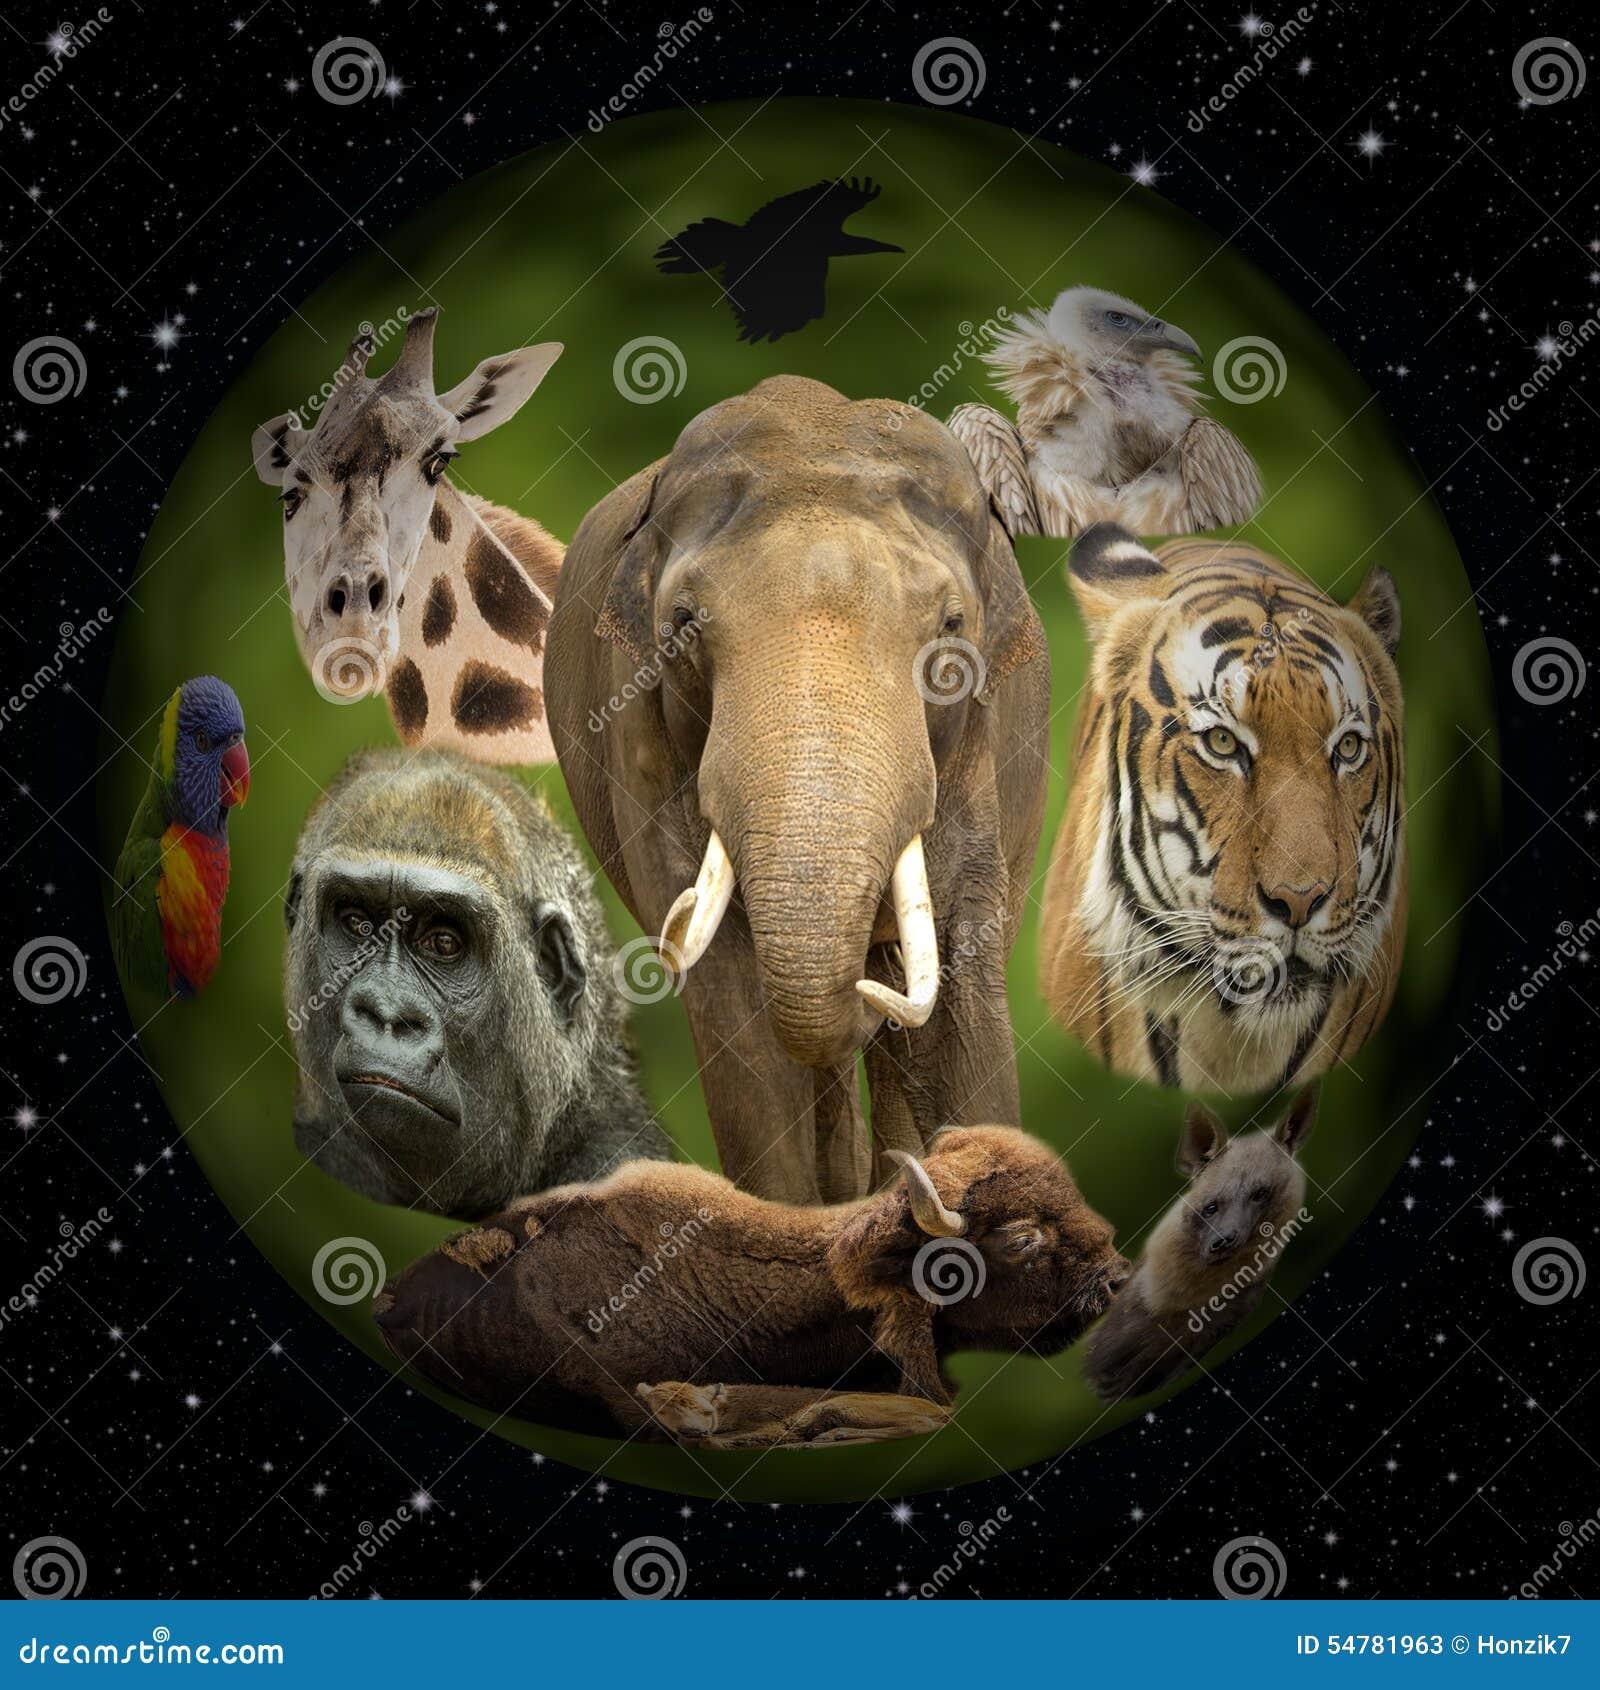 planet earth animals - photo #39